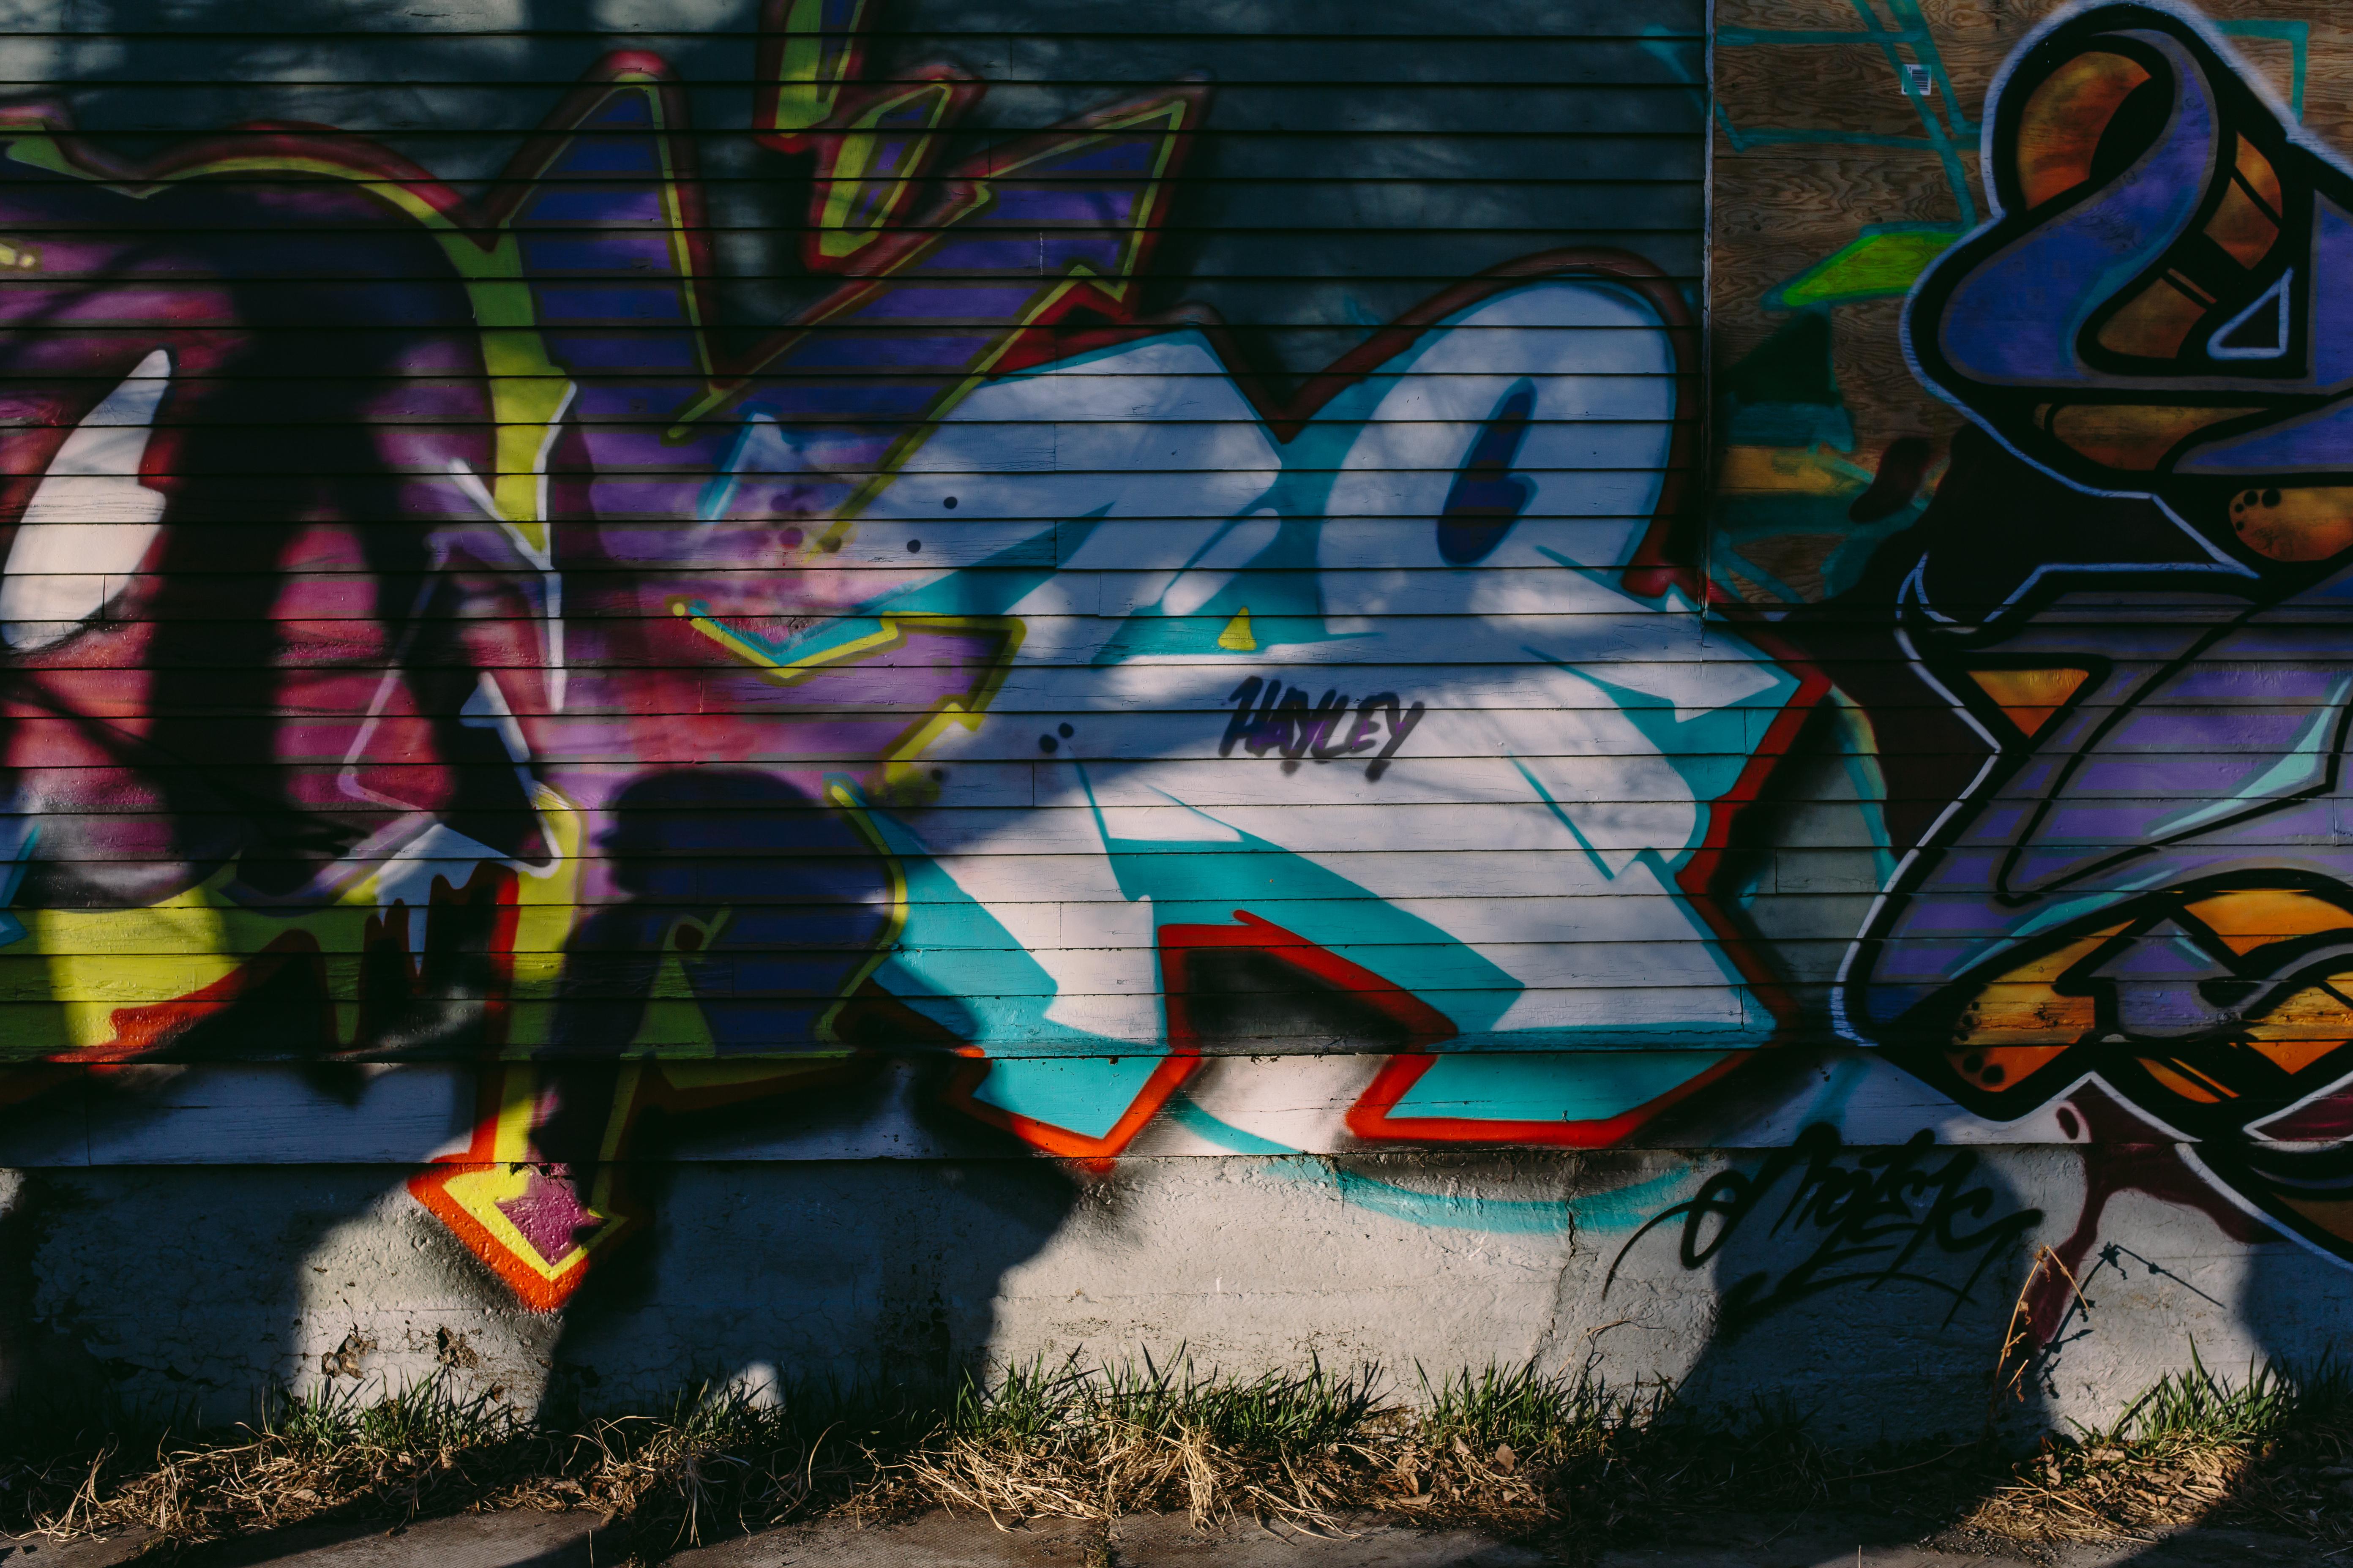 WreckCity-075.jpg